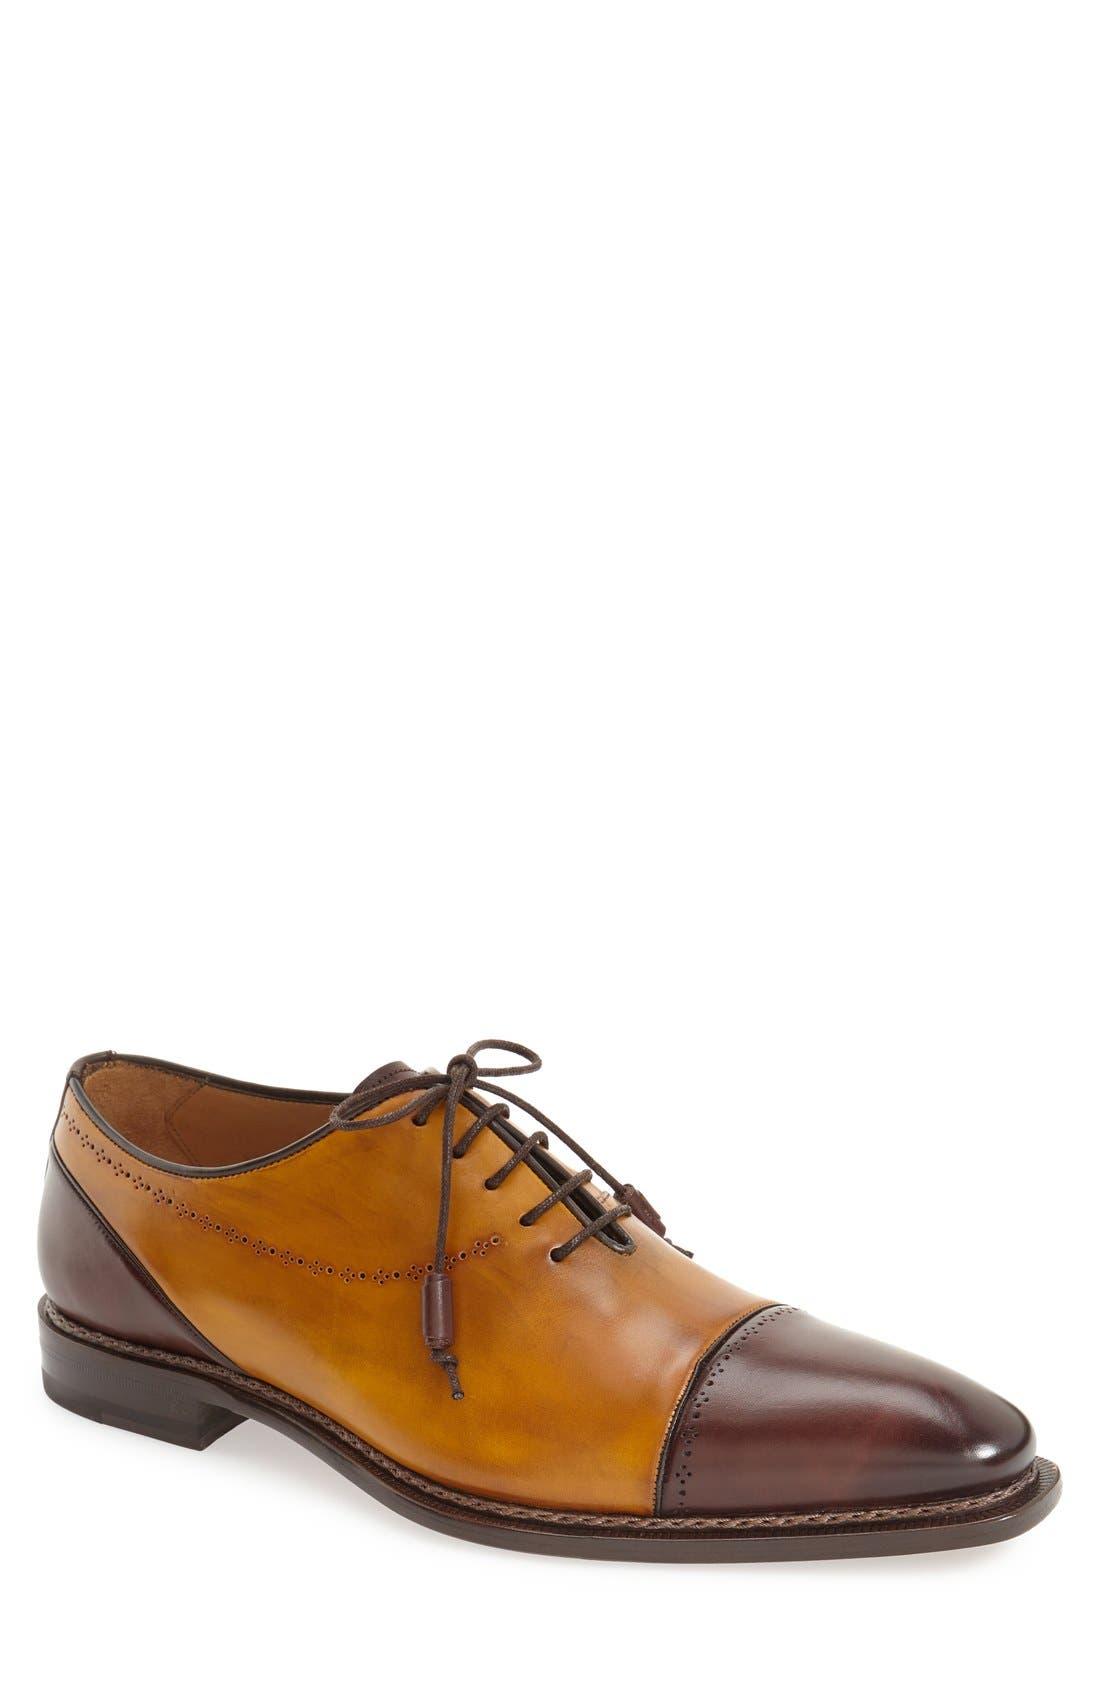 'Antico' Cap Toe Oxford,                         Main,                         color, 700